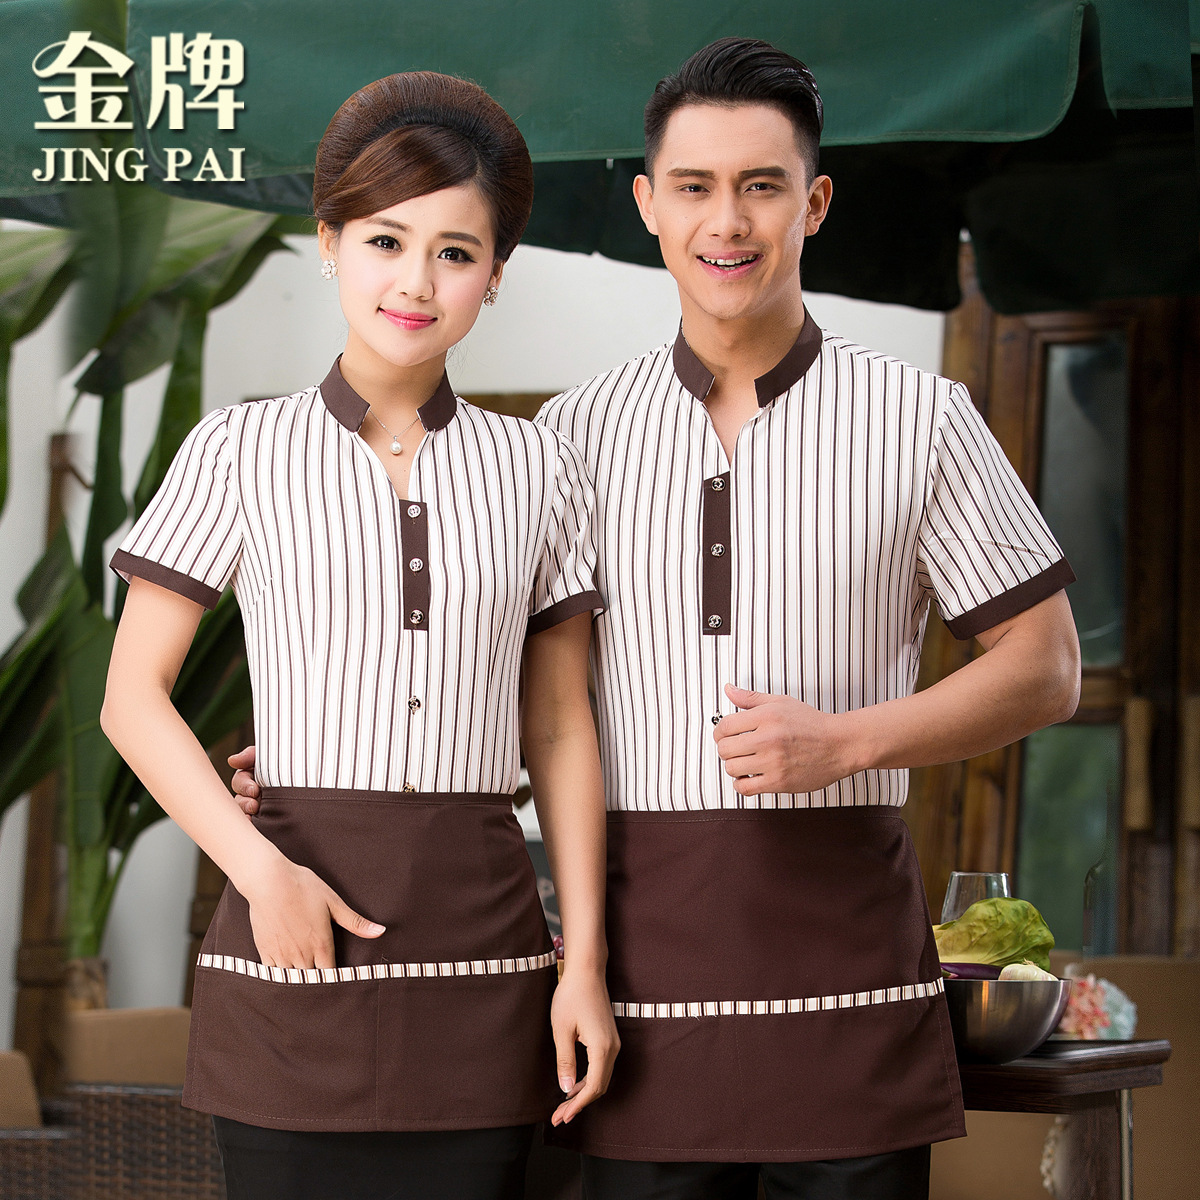 Hotel Overalls Waitress Short-sleeved Uniform Fast-food Shop Cafe Camarero Work Clothes Women Men Waiter Uniforme Shirt H2297